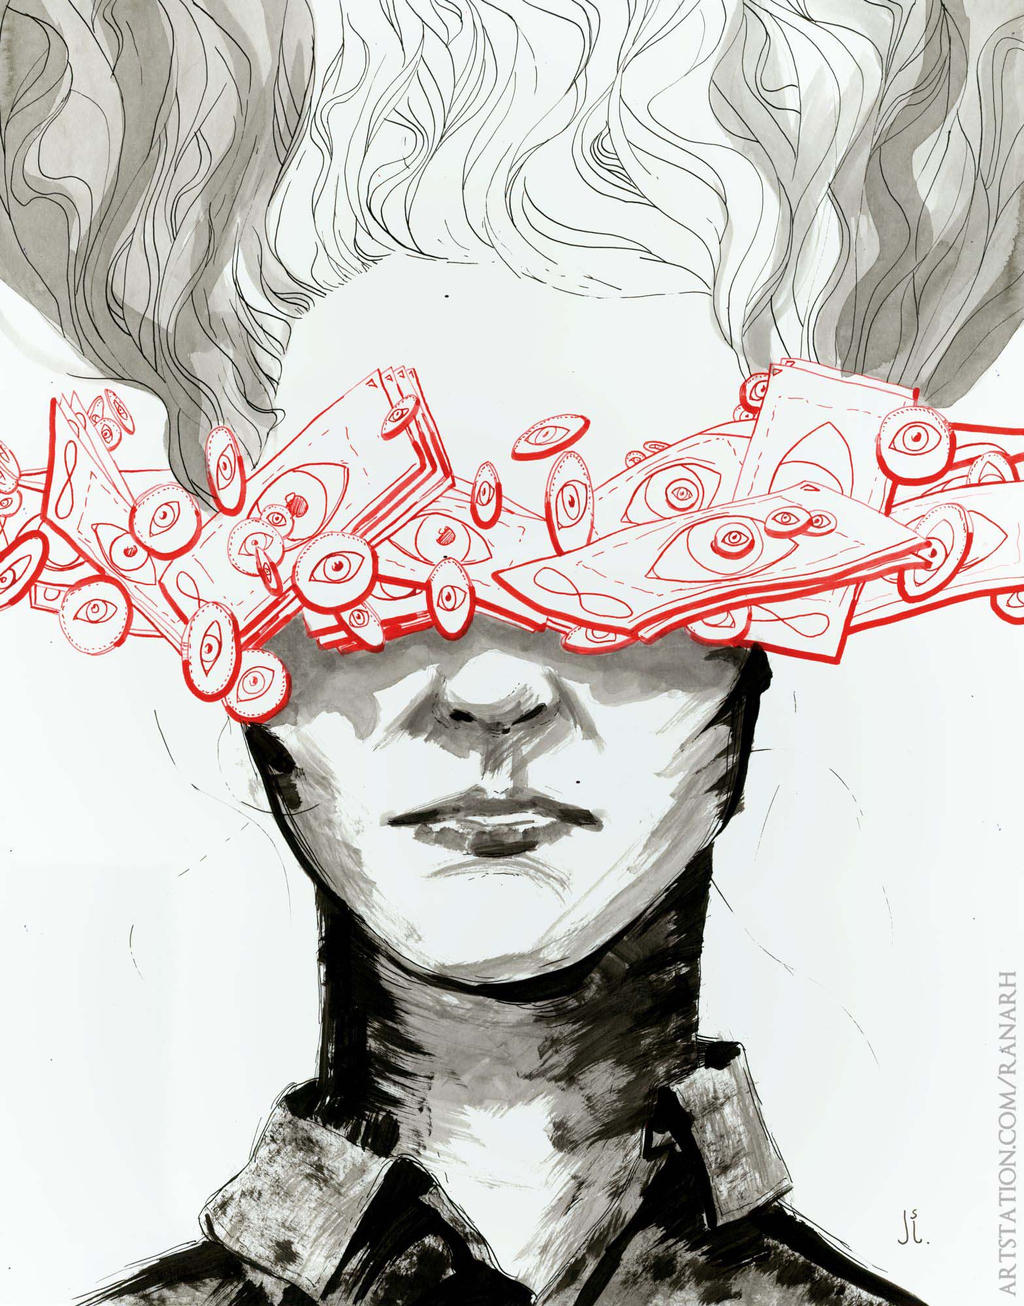 Month of Fear/Inktober: Blindness by Ranarh